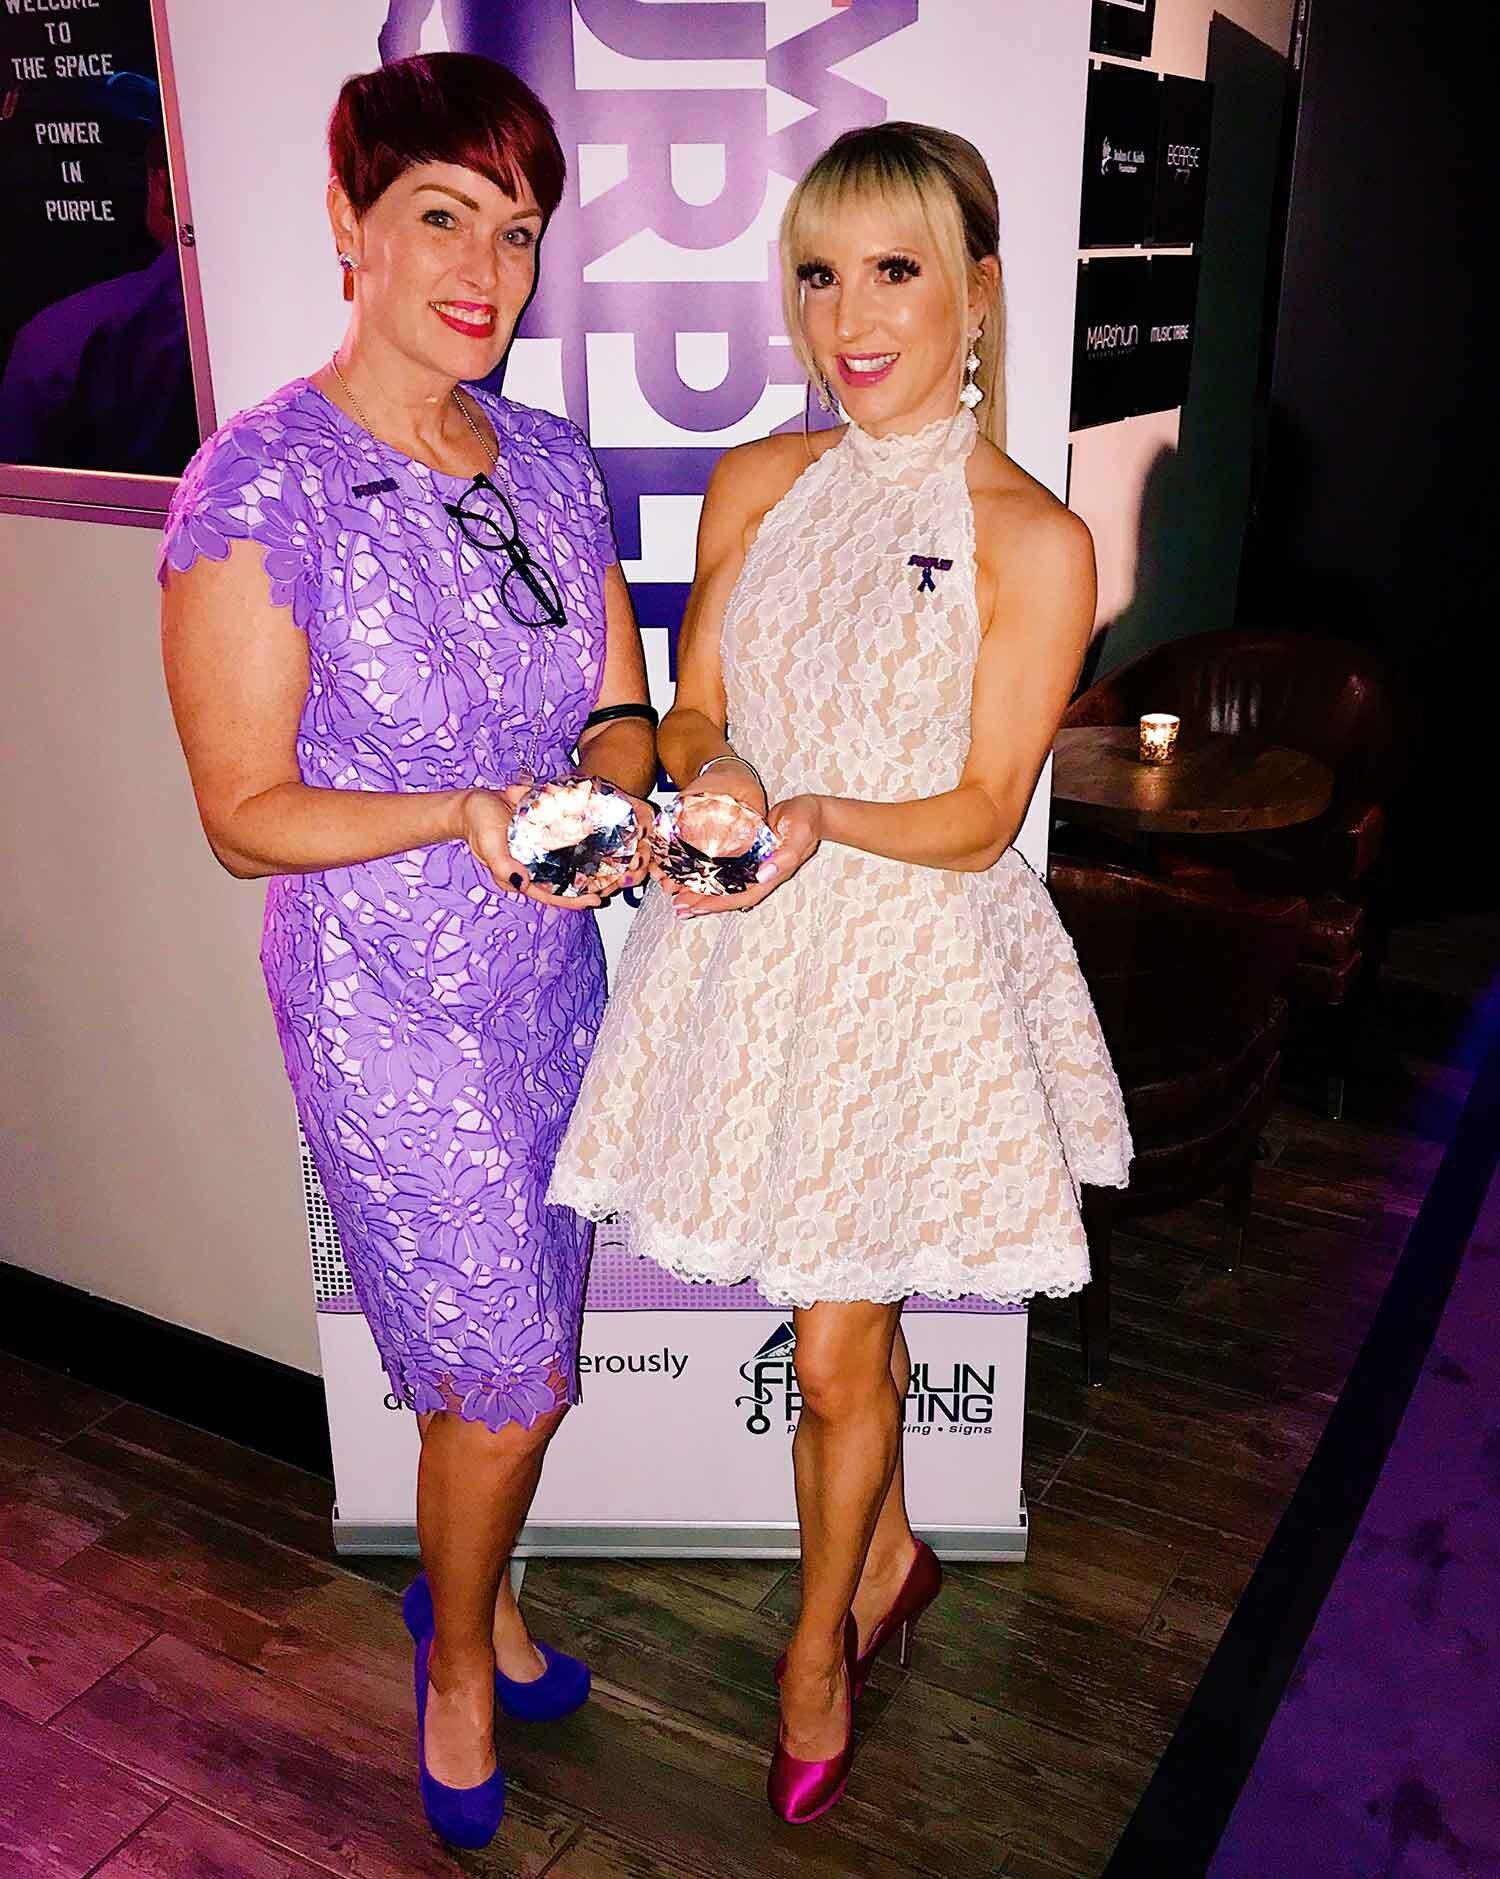 Hairdresser Andeen Clark and Fitness model Eve Dawes receiving awards